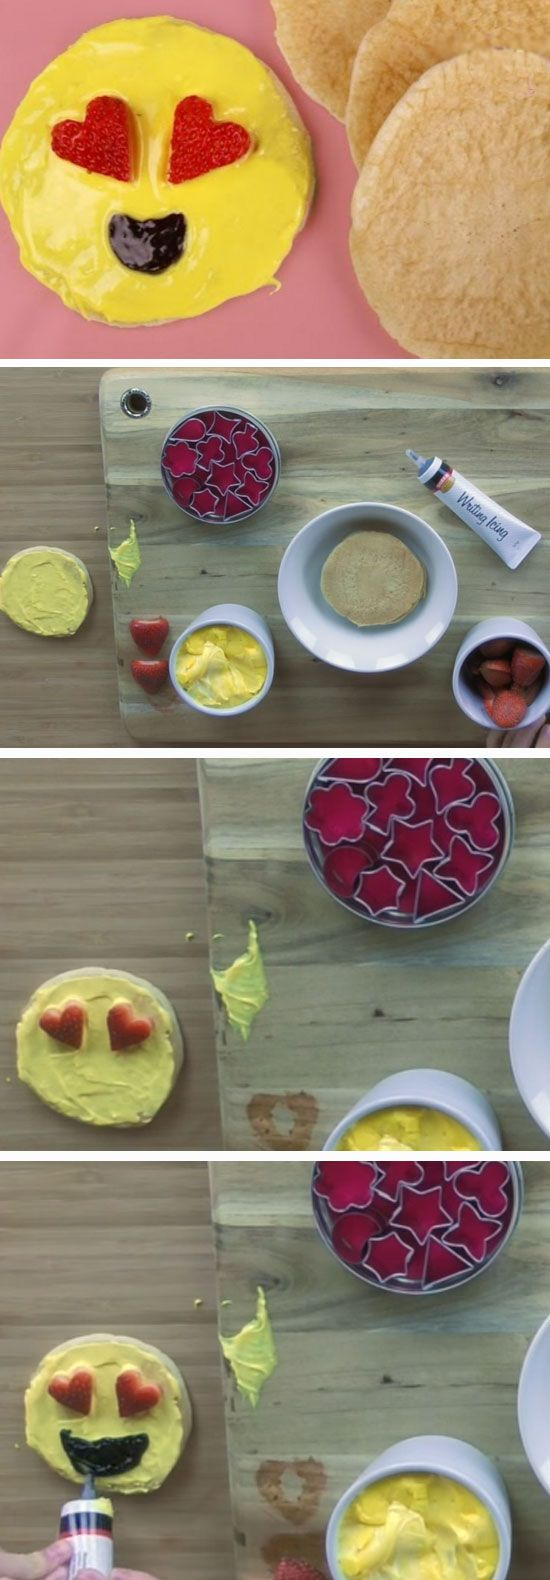 Best 25 pancake face ideas only on pinterest kids for Easy breakfast in bed ideas